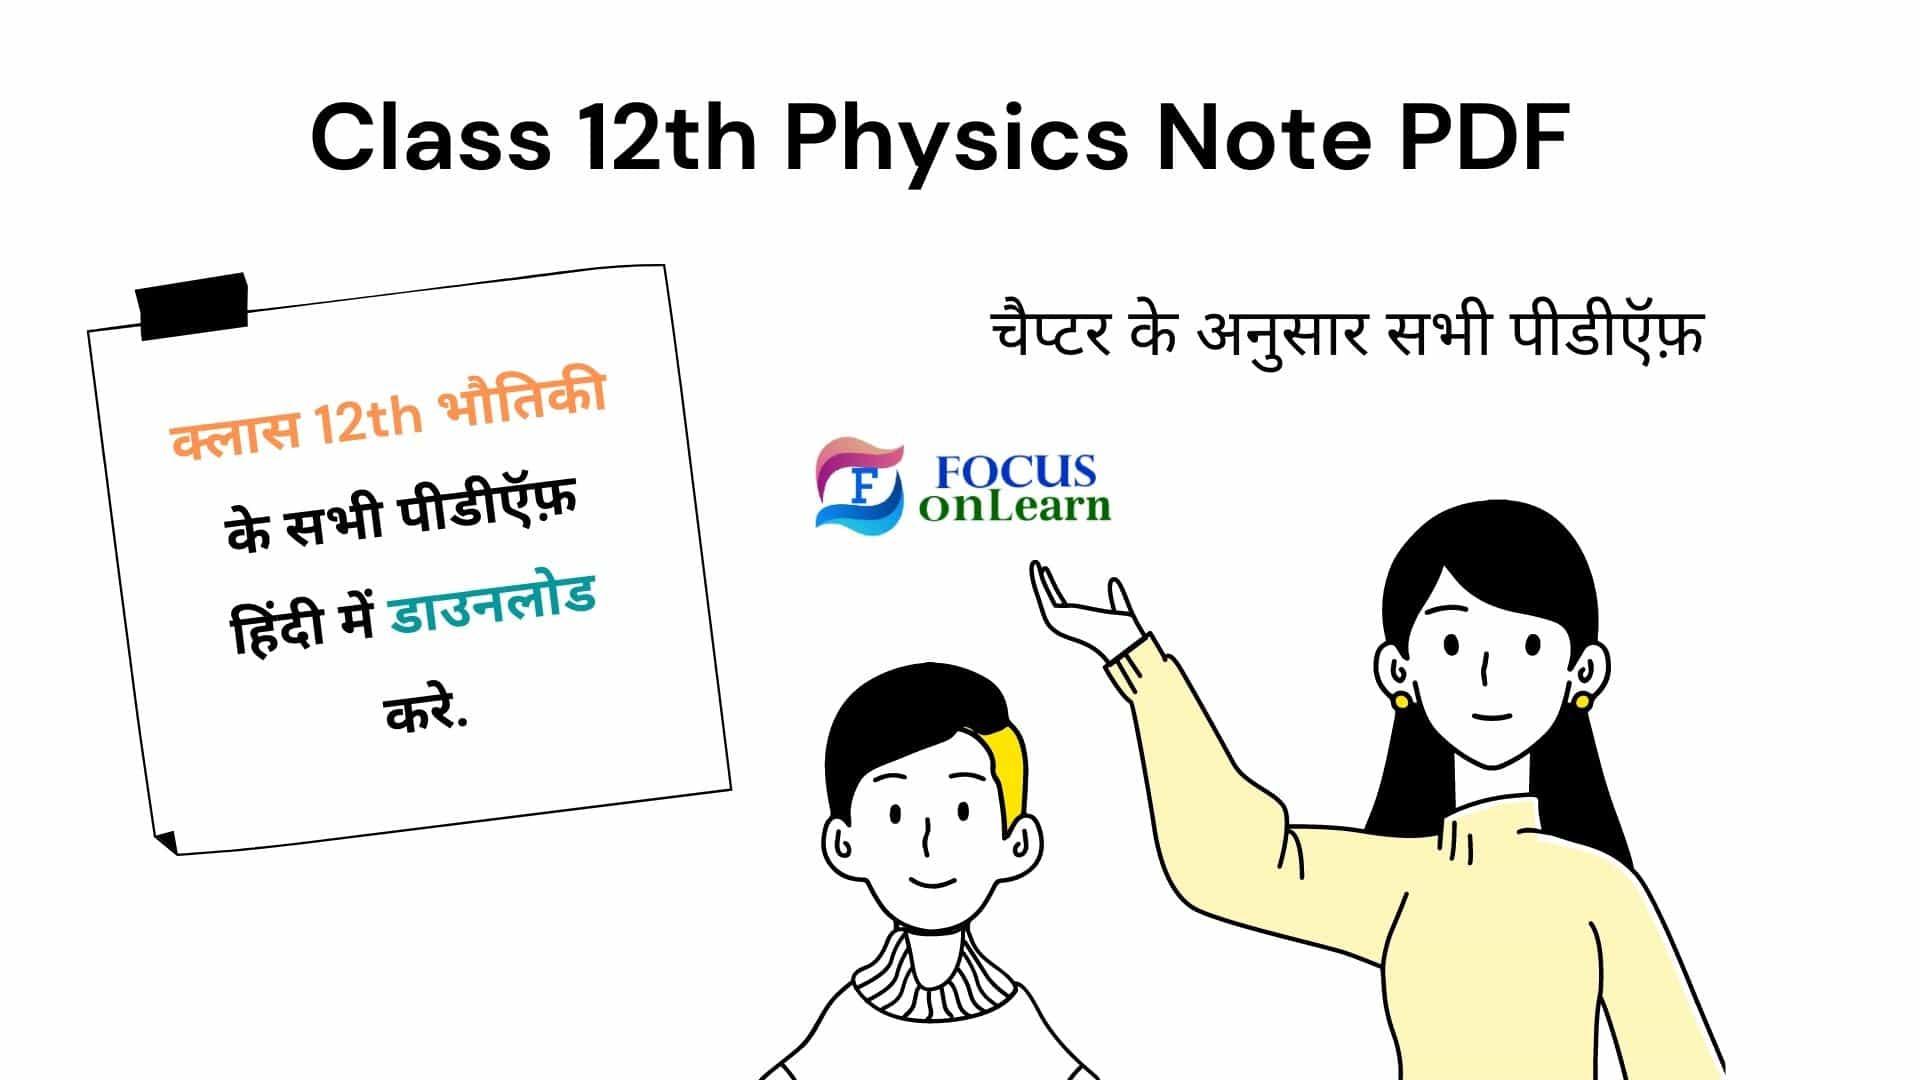 Class 12th Physics Note PDF in Hindi